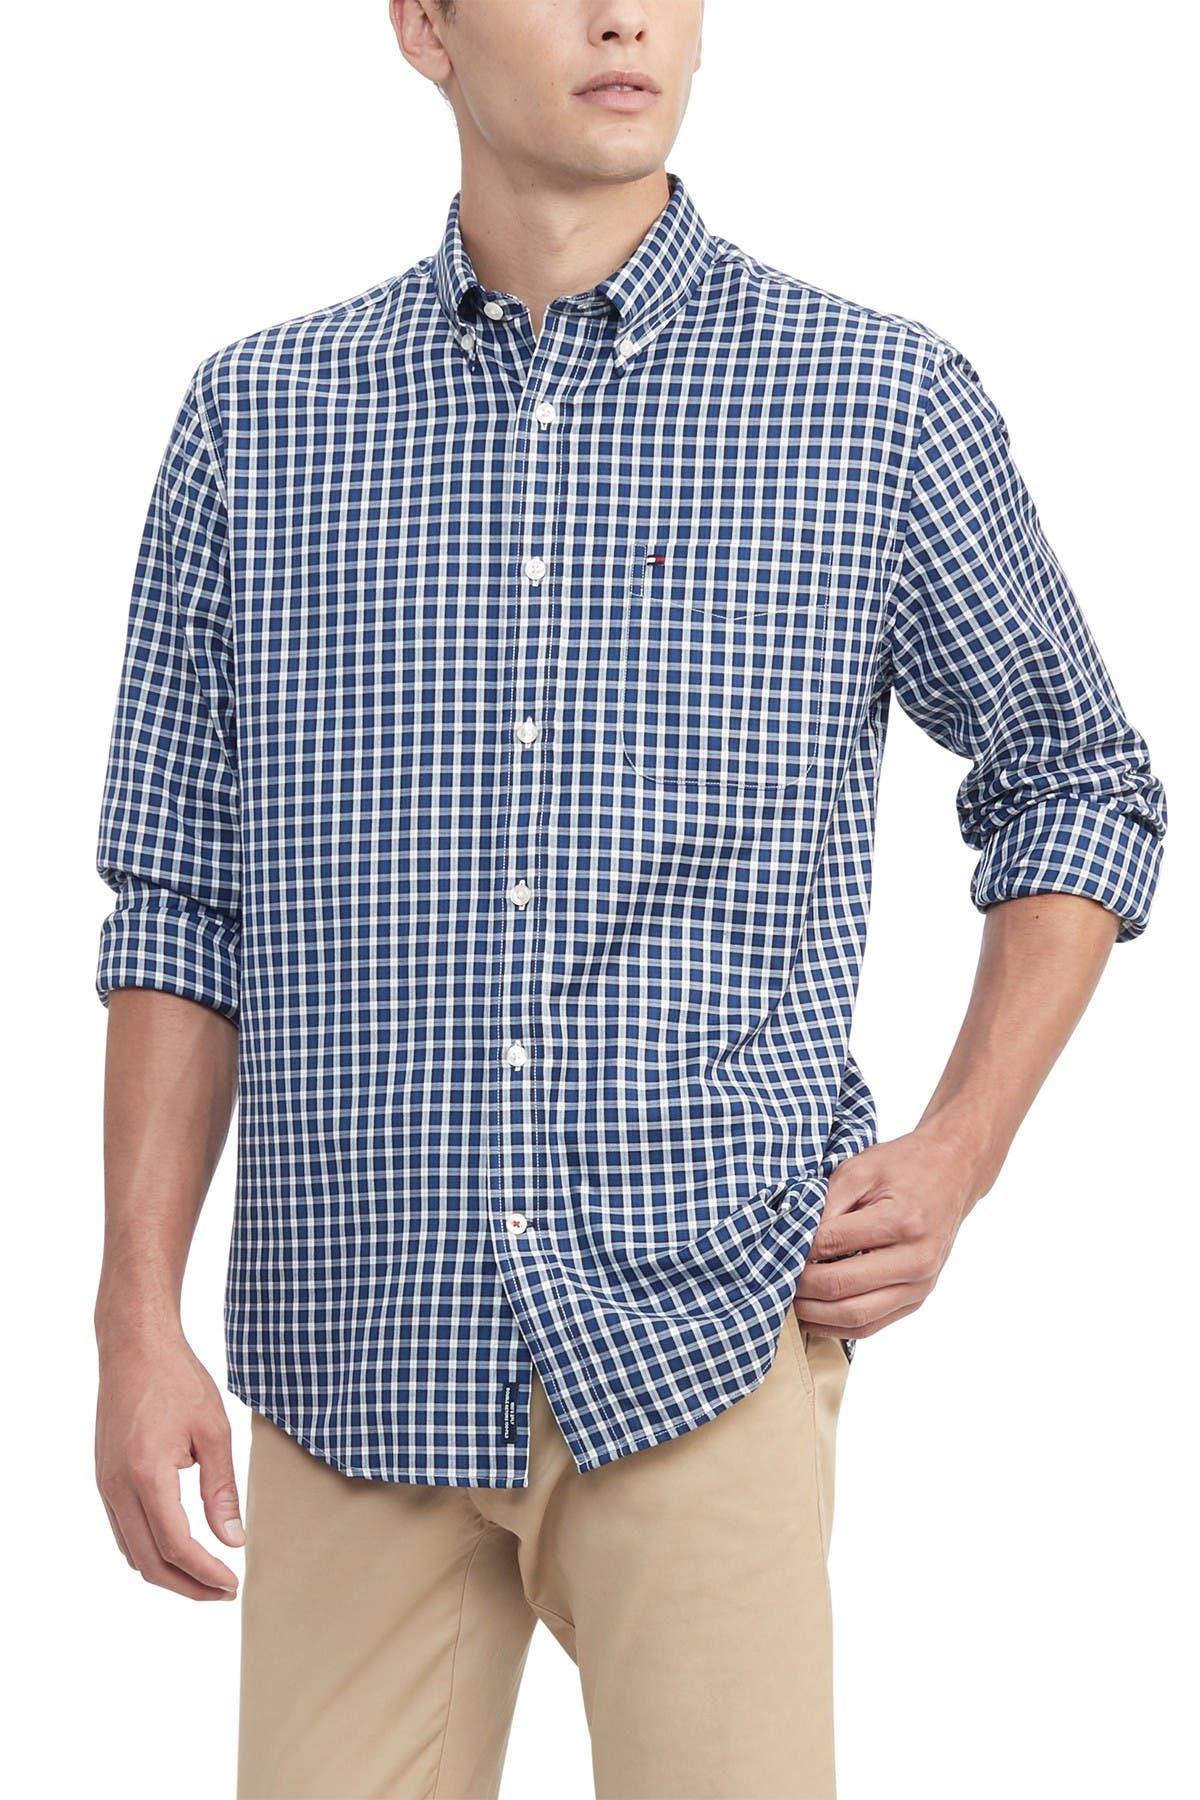 Tommy Hilfiger Men/'s Casual Button-Down Shirt